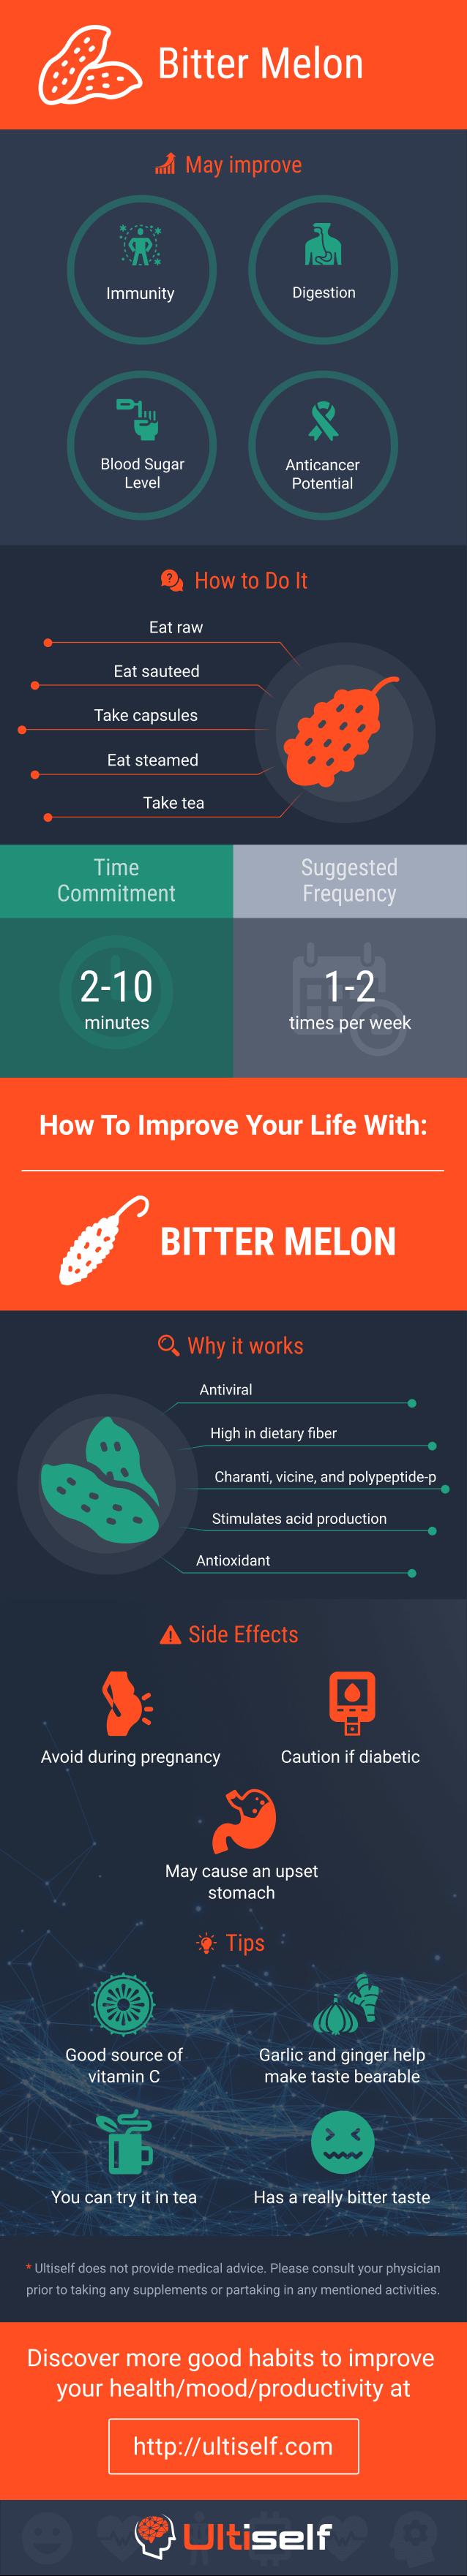 Bitter Melon infographic